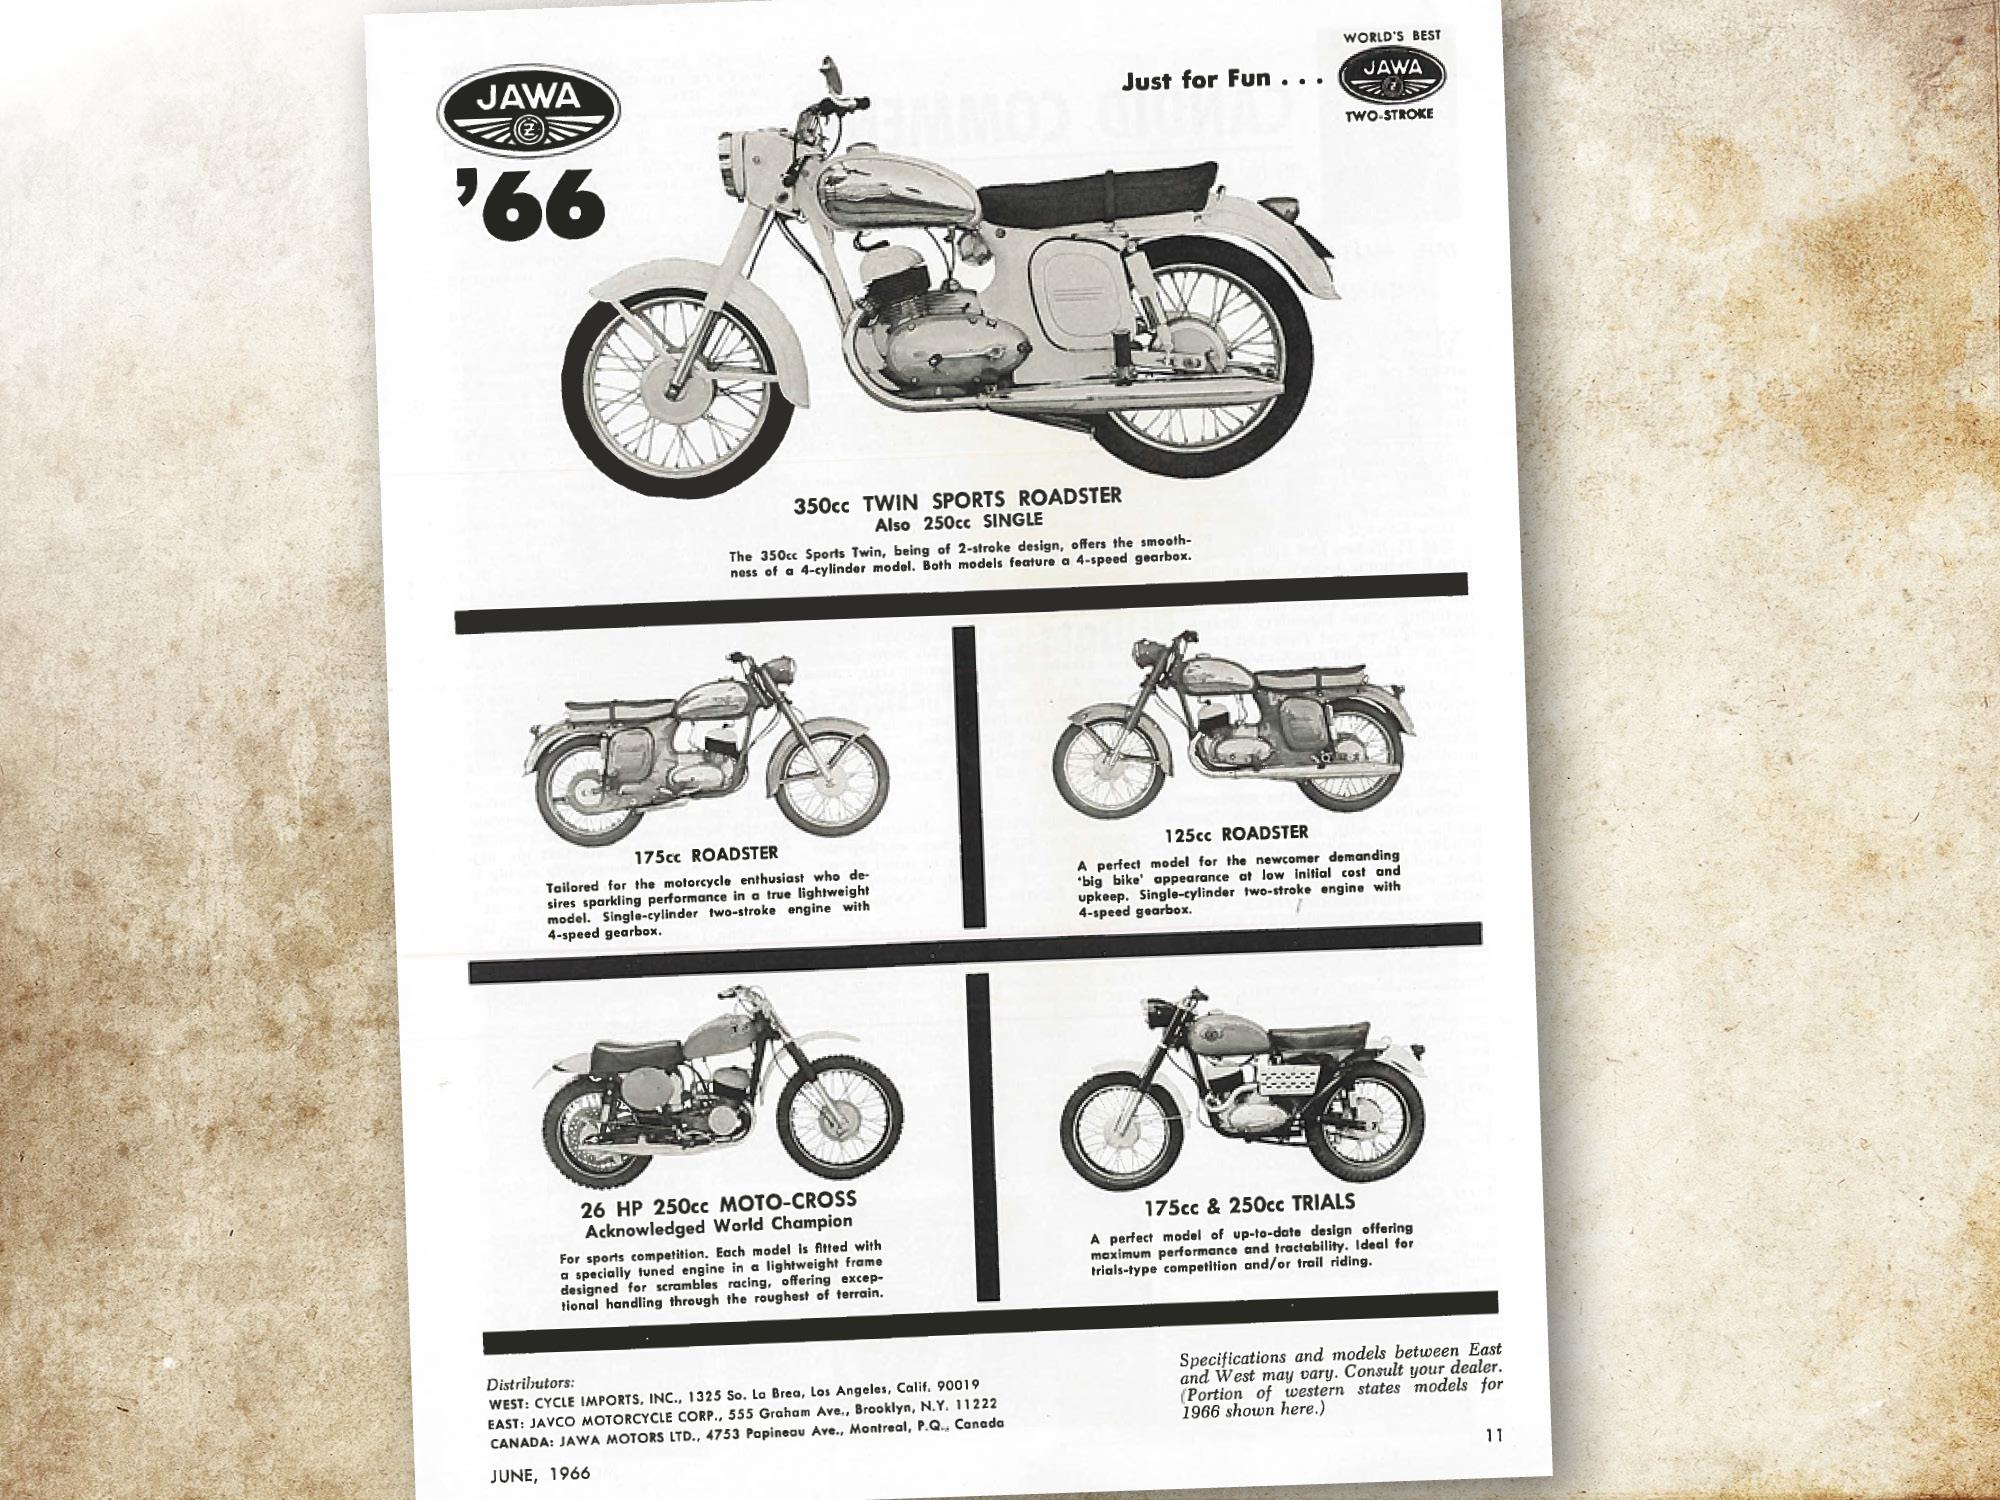 Motorcyclist Archives 1966: 85cc Kawasaki, BMW 4 and a